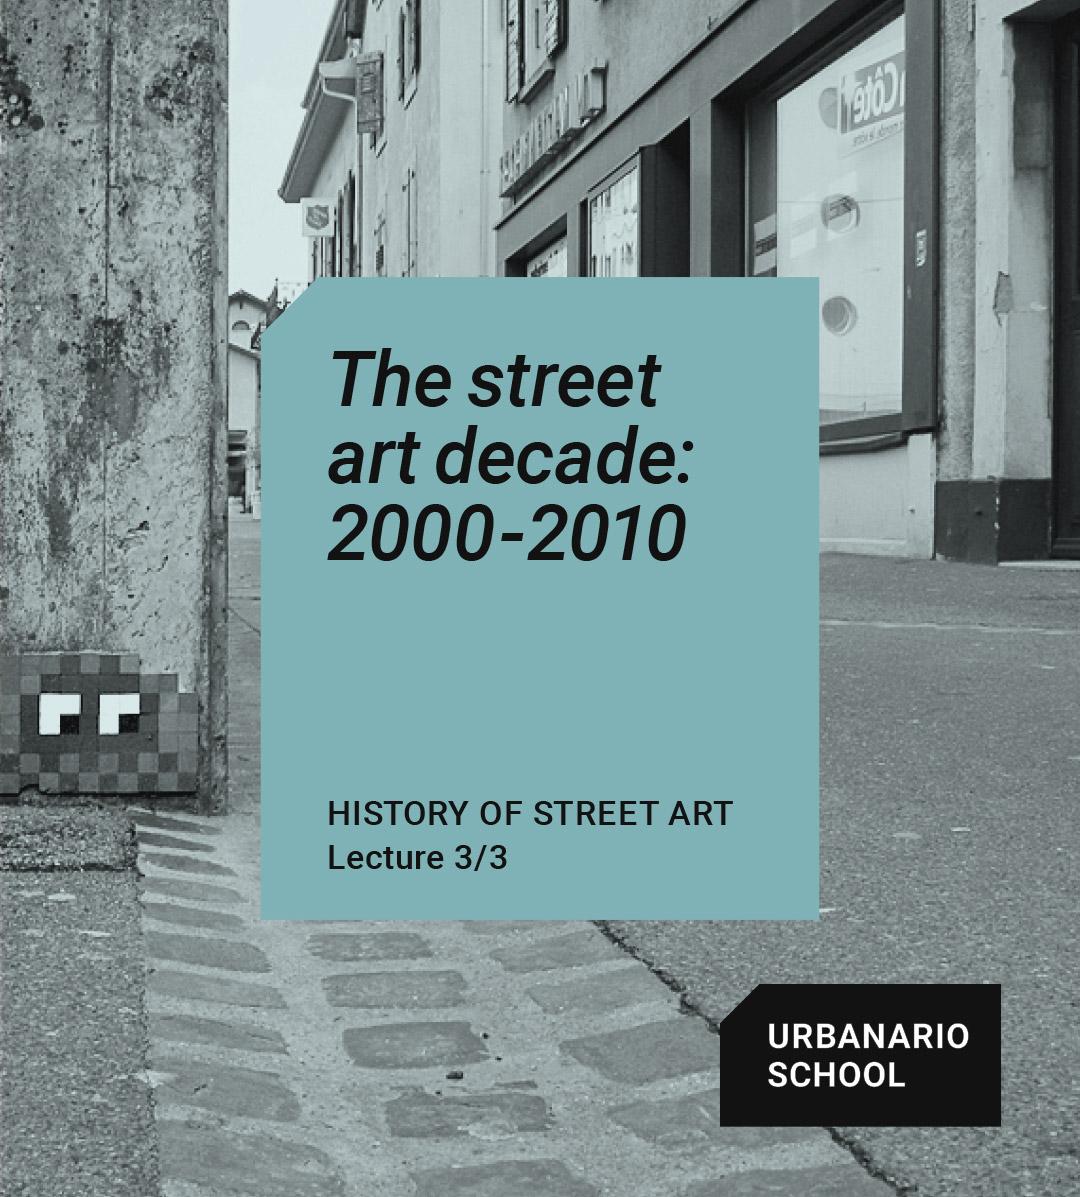 The decade of street art - Urbanario School